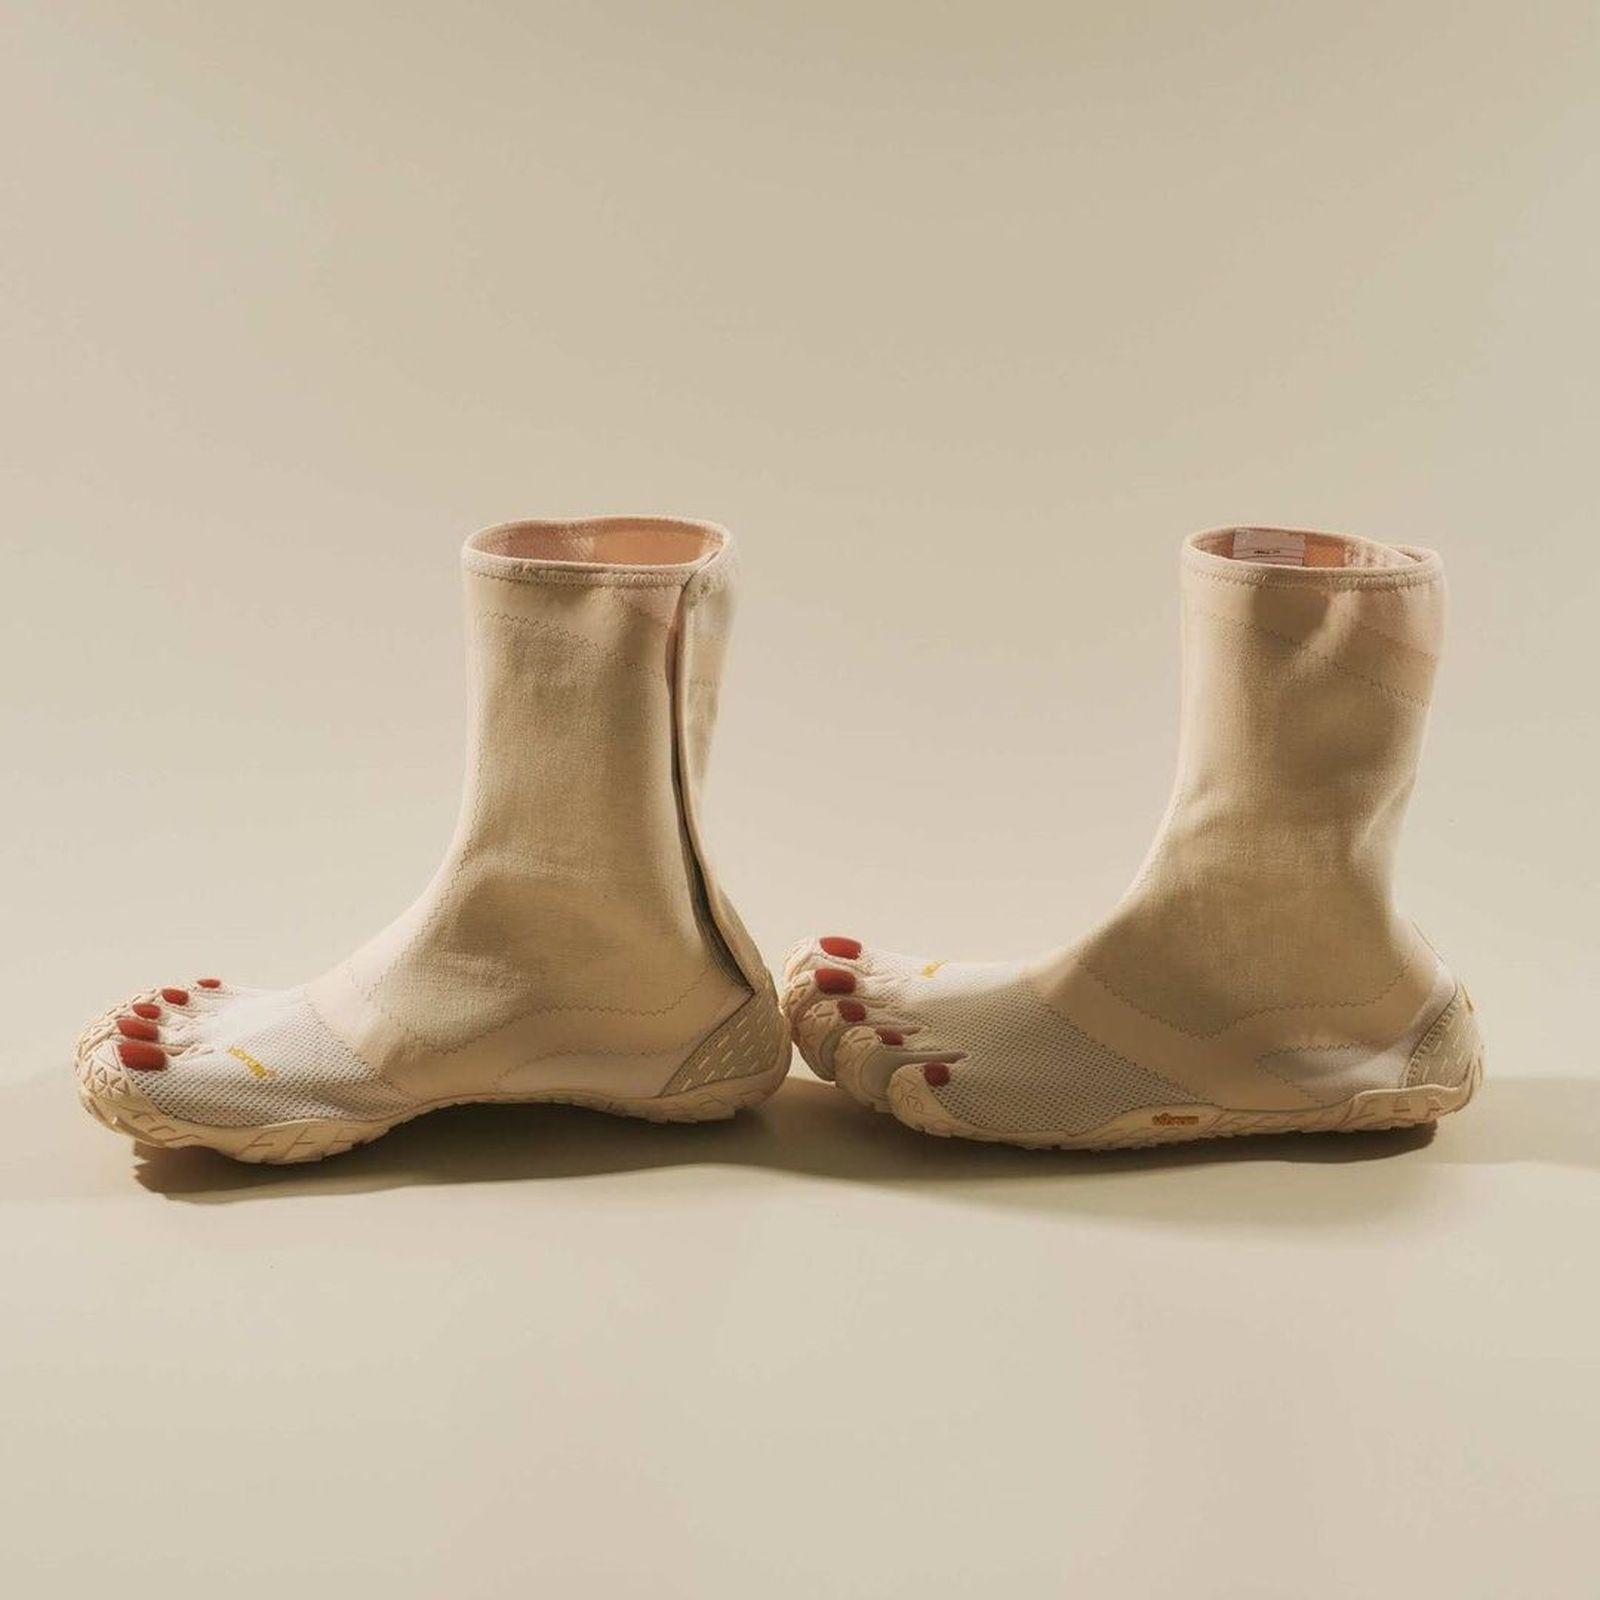 vibram-suicoke-midorikawa-toe-shoe-04